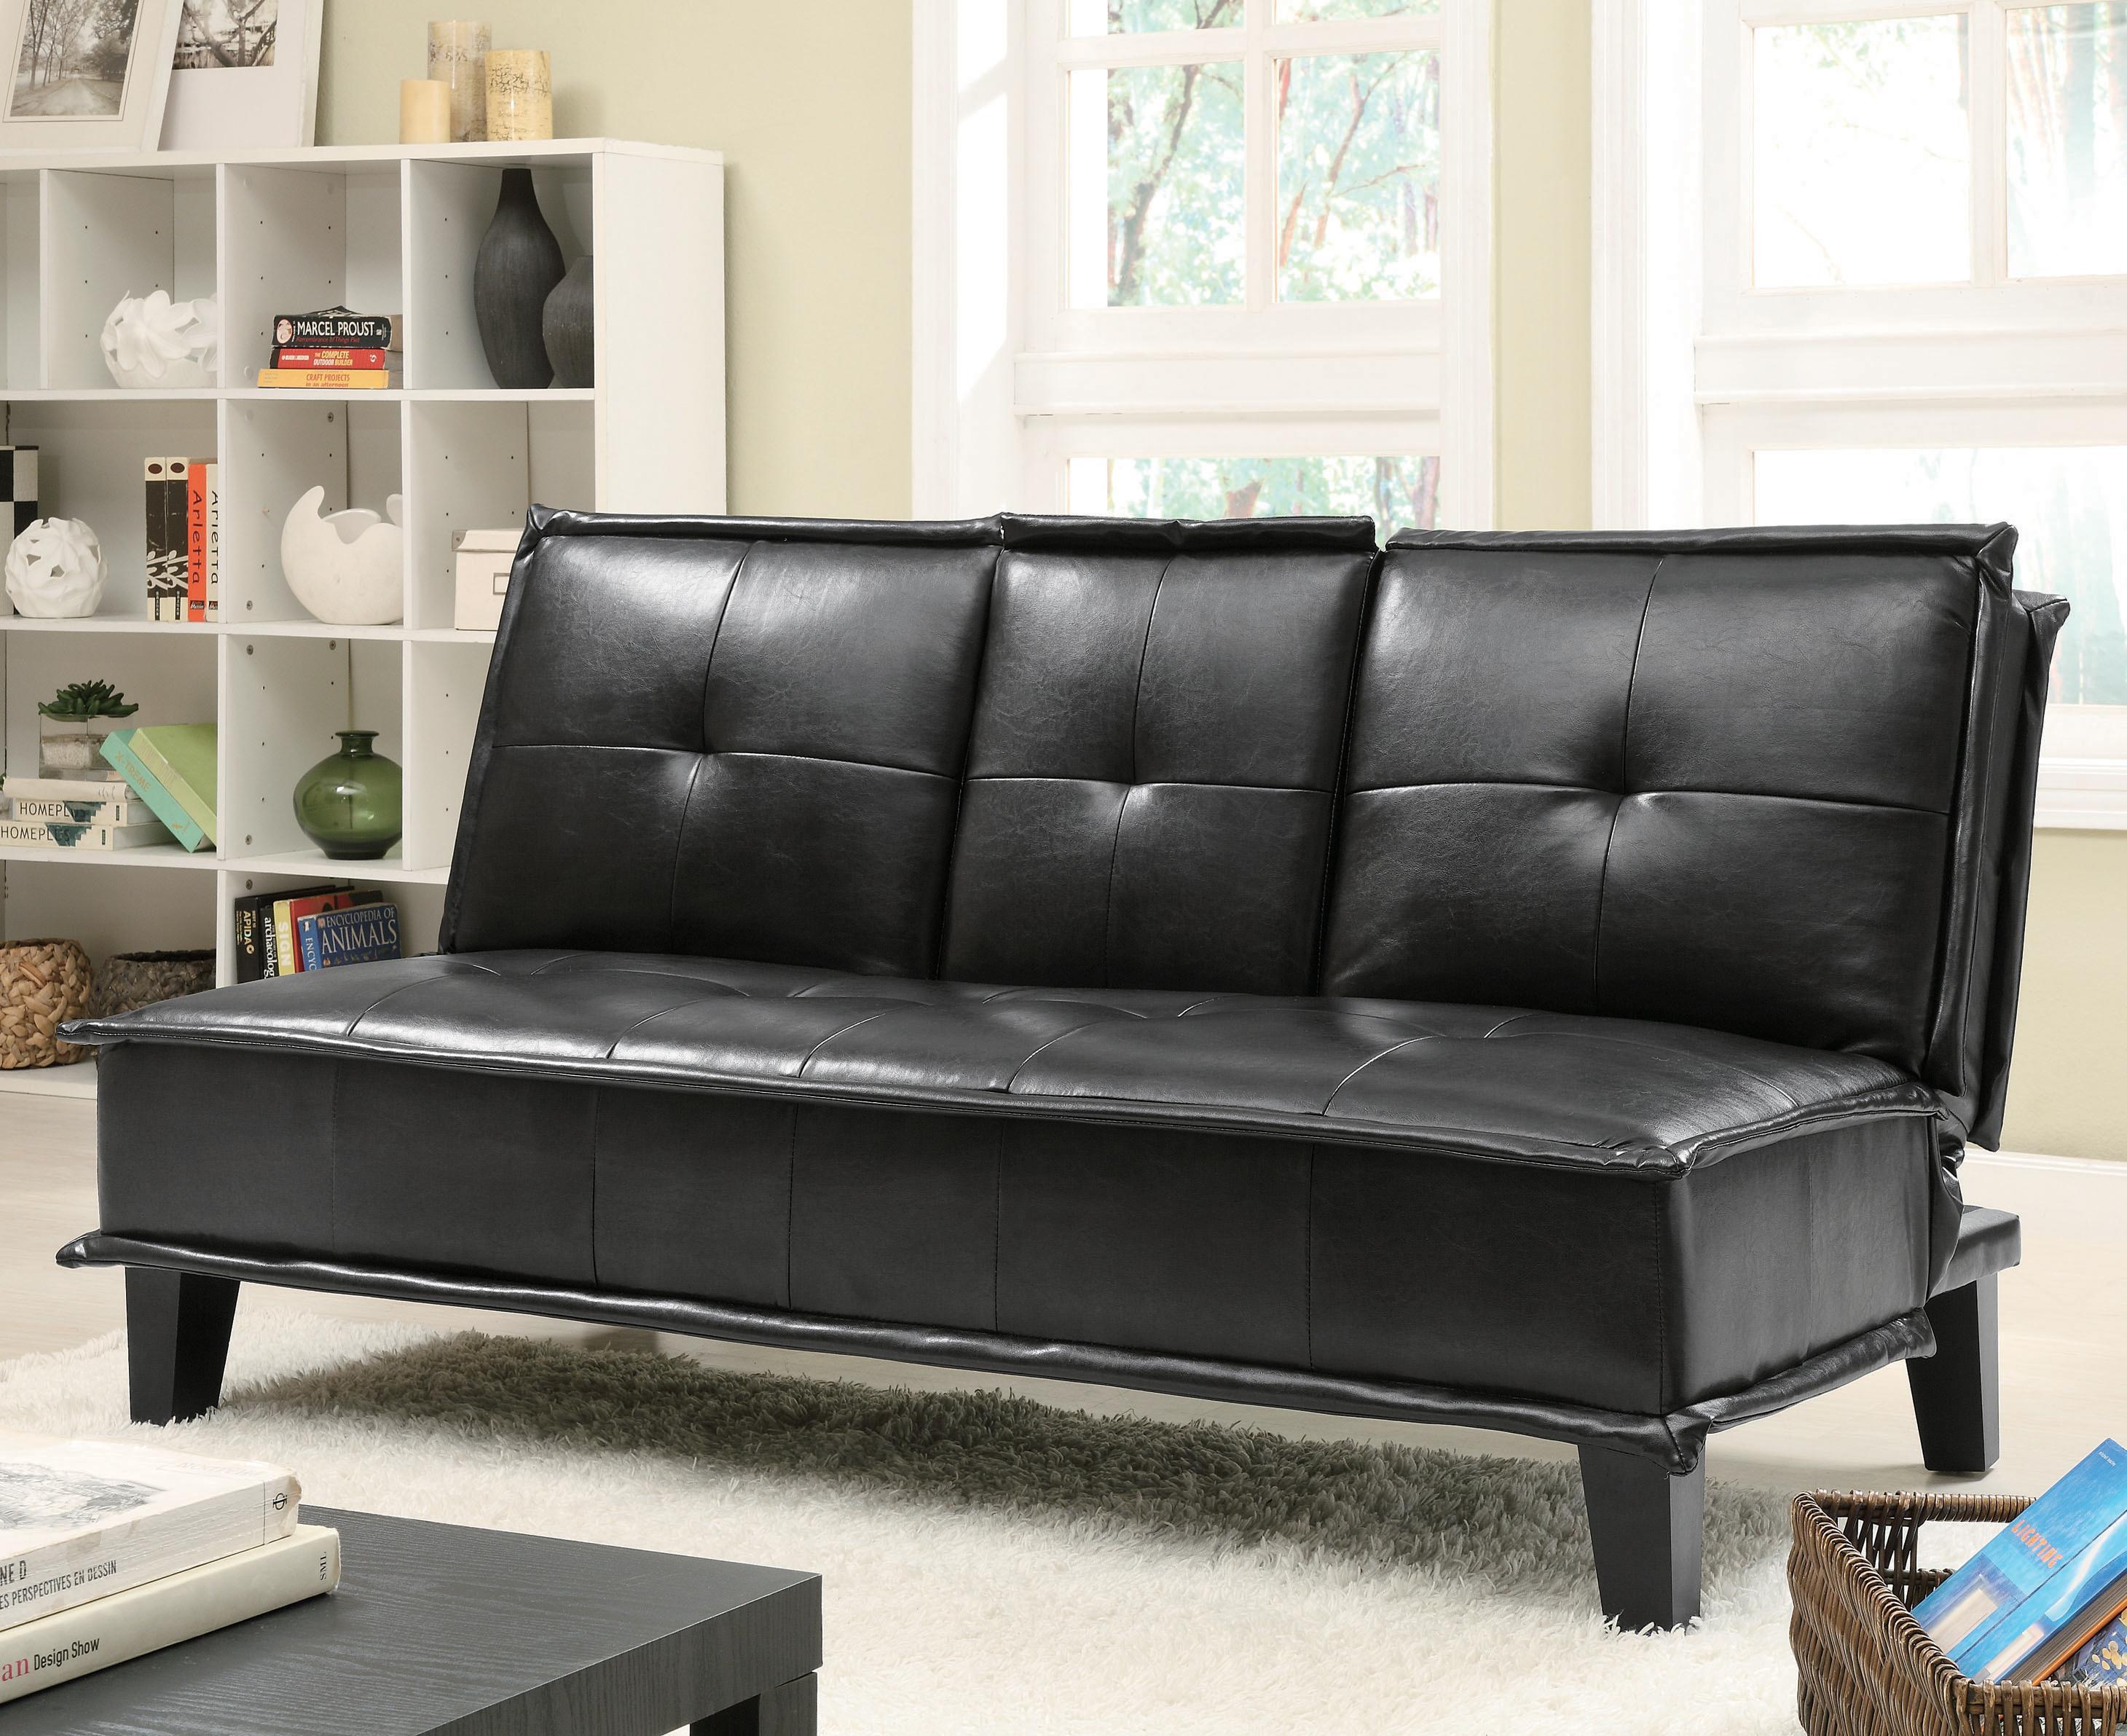 Contemporary Black Vinyl Sofa Bed with Drop Down Table   Big City Futon